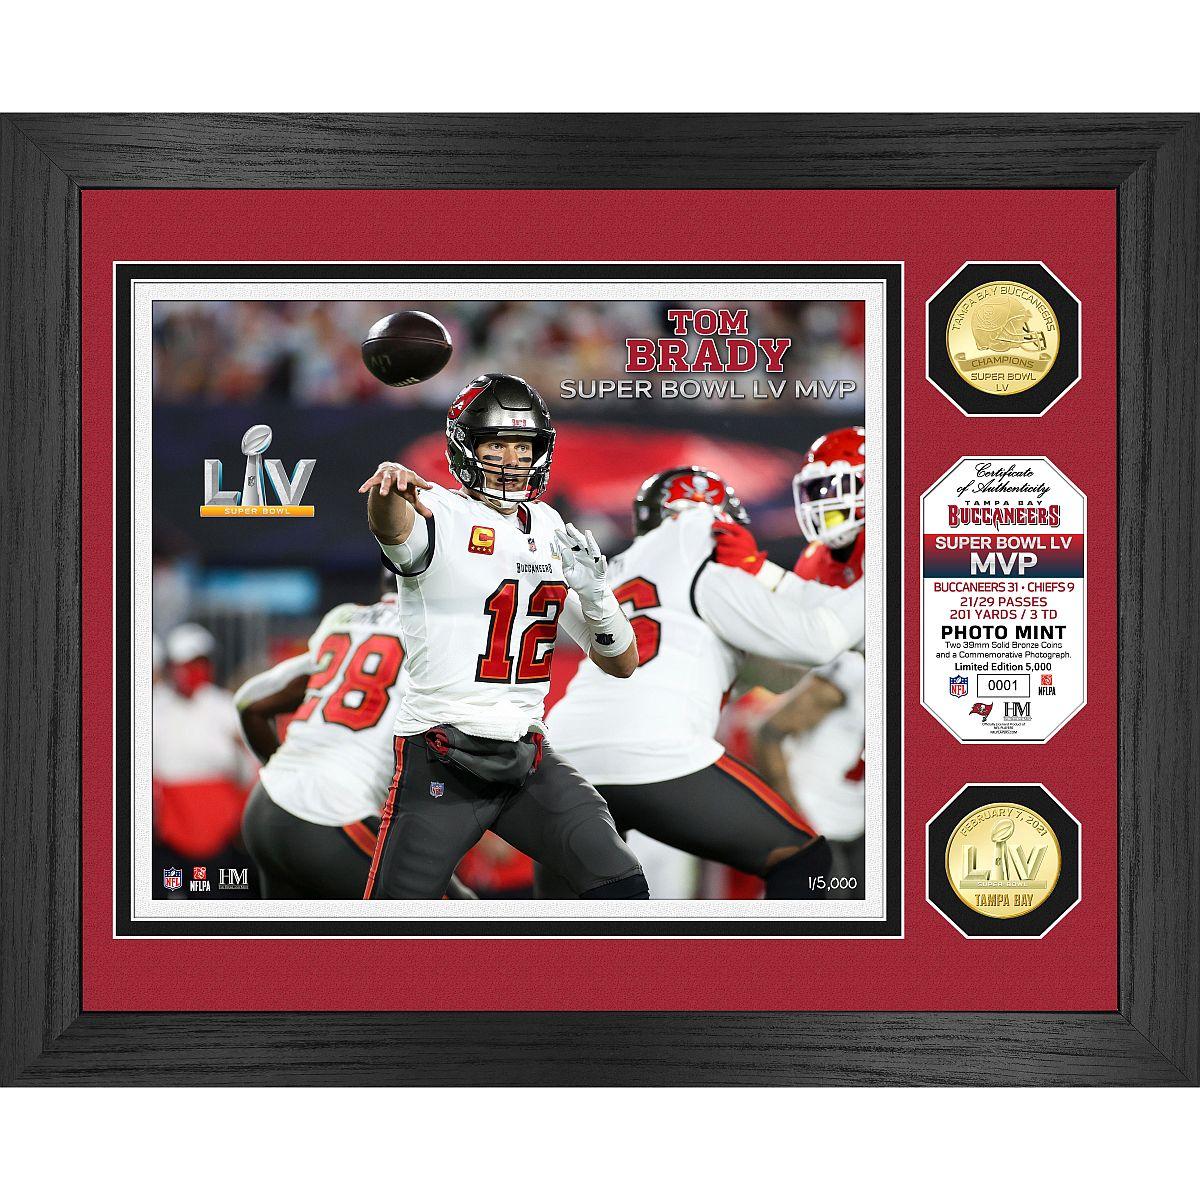 Tampa Bay Buccaneers Super Bowl 55 MVP Bronze Coin Photo Mint